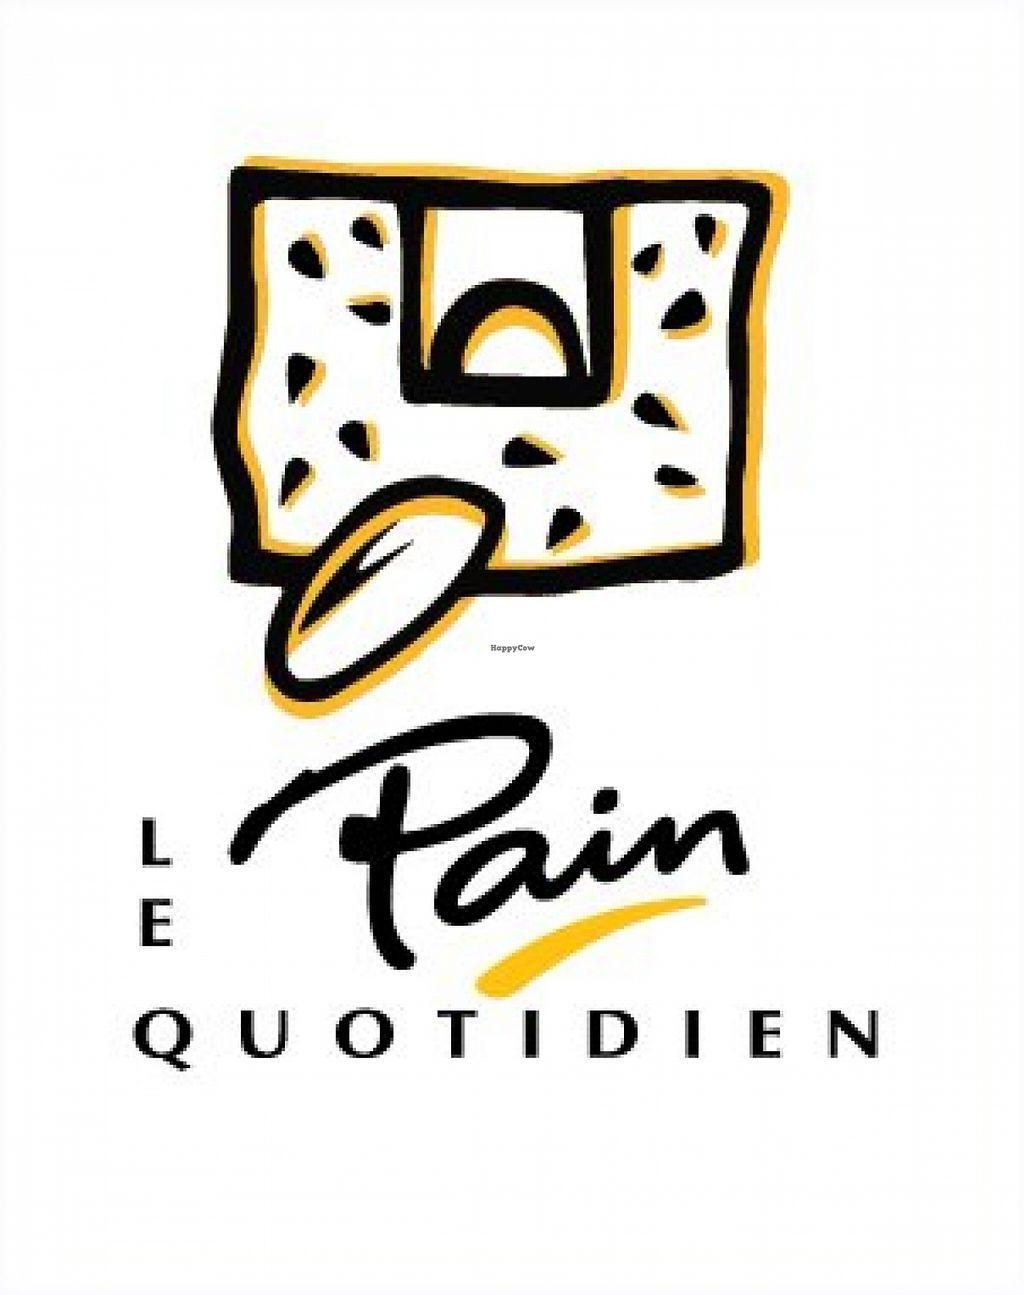 "Photo of Le Pain Quotidien - Sablon  by <a href=""/members/profile/community"">community</a> <br/>Le Pain Quotidien <br/> February 28, 2016  - <a href='/contact/abuse/image/70236/138065'>Report</a>"